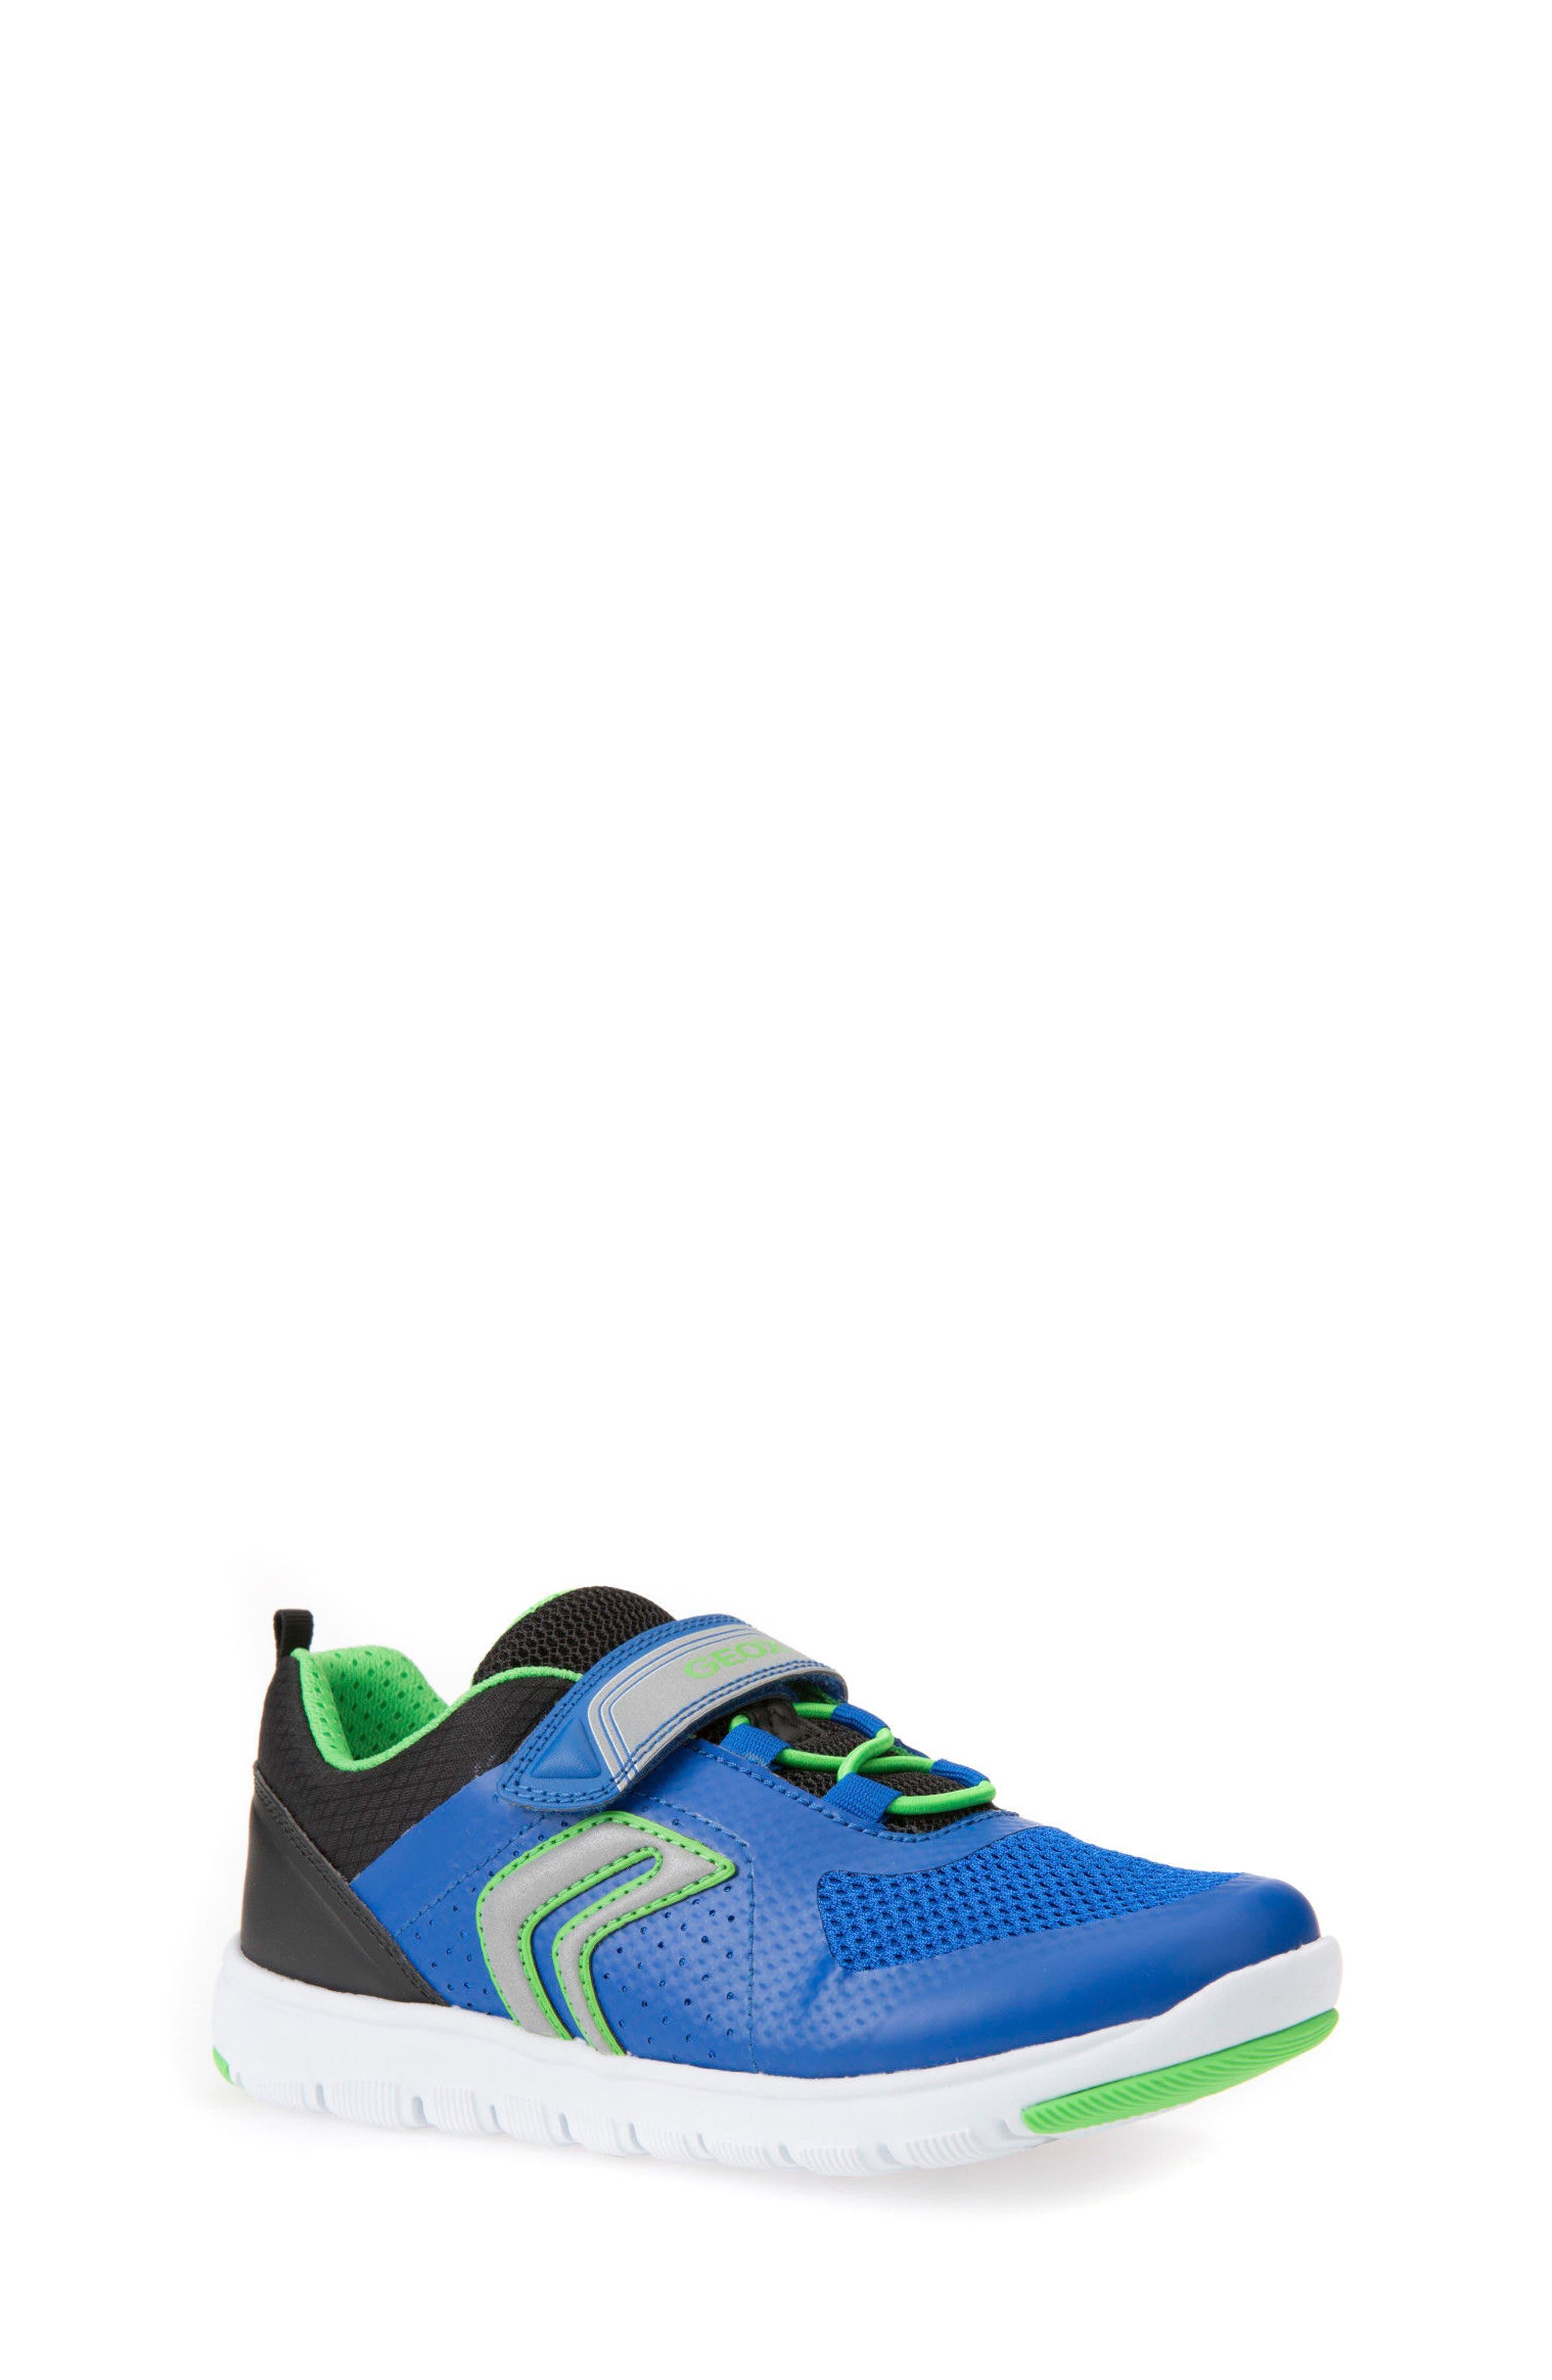 Alternate Image 1 Selected - Geox Xunday Low Top Sneaker (Toddler, Little Kid & Big Kid)